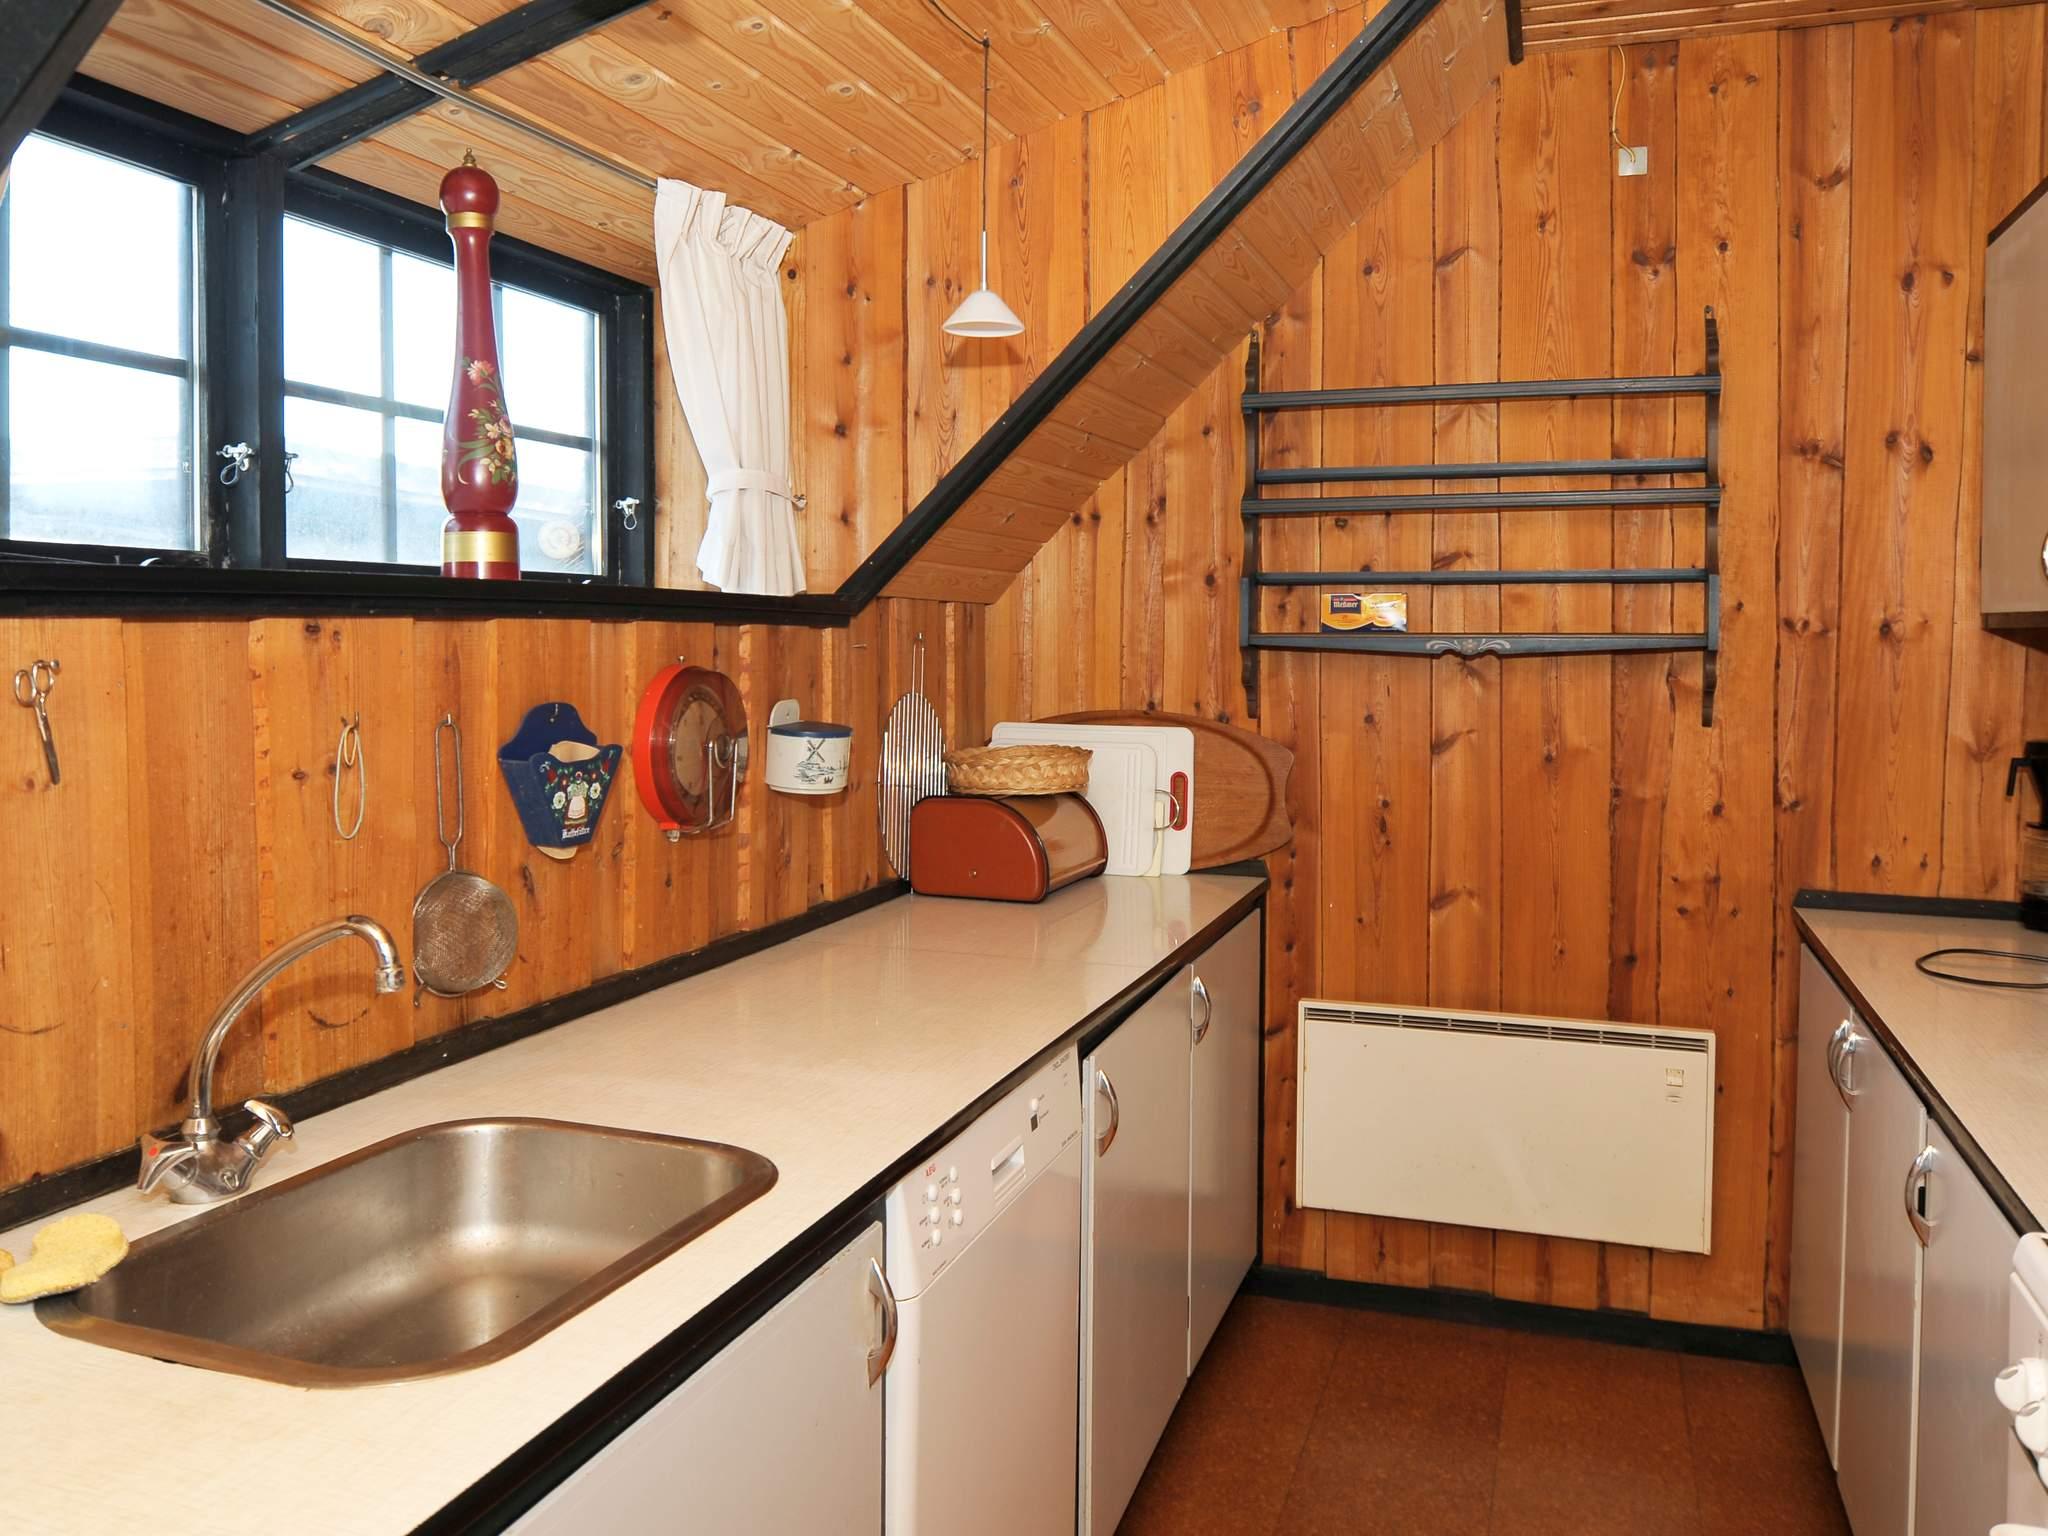 Ferienhaus Blåvand (82266), Blåvand, , Westjütland, Dänemark, Bild 10